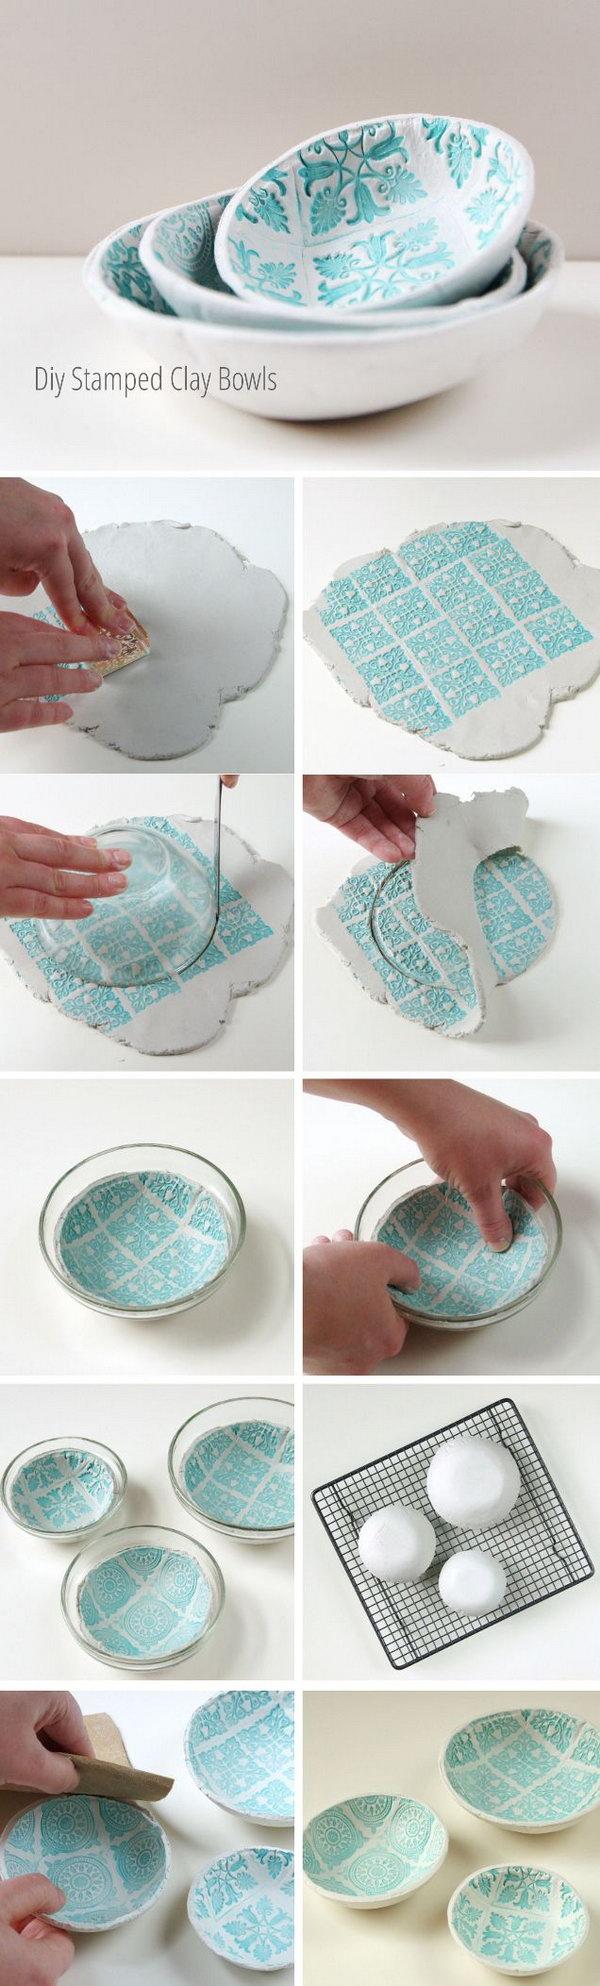 DIY Stamped Clay Bowls.